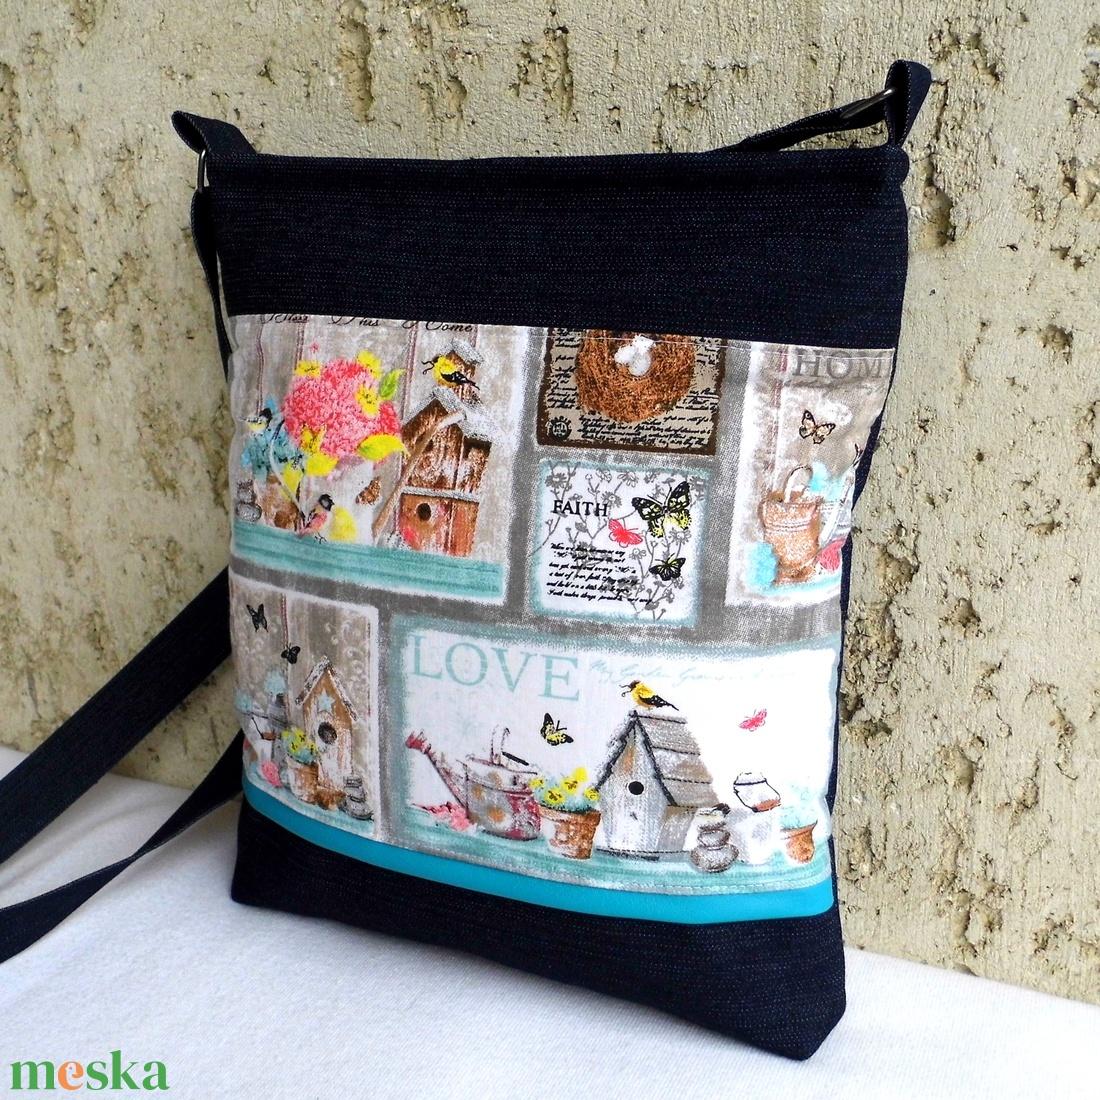 Vidéki romantika - női táska (smagdi) - Meska.hu 01c52920a1